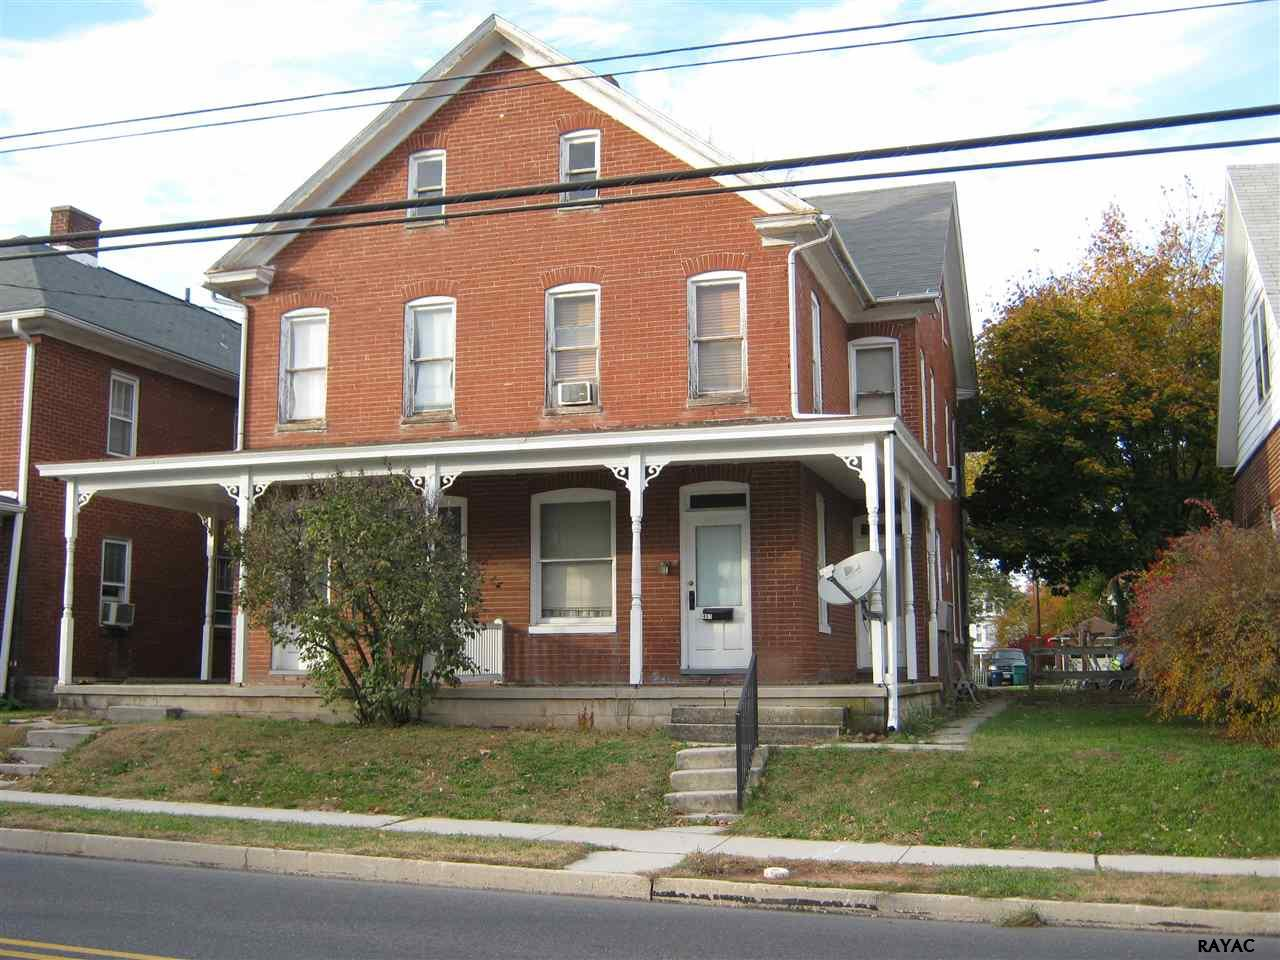 W Middle St, Gettysburg, PA 17325